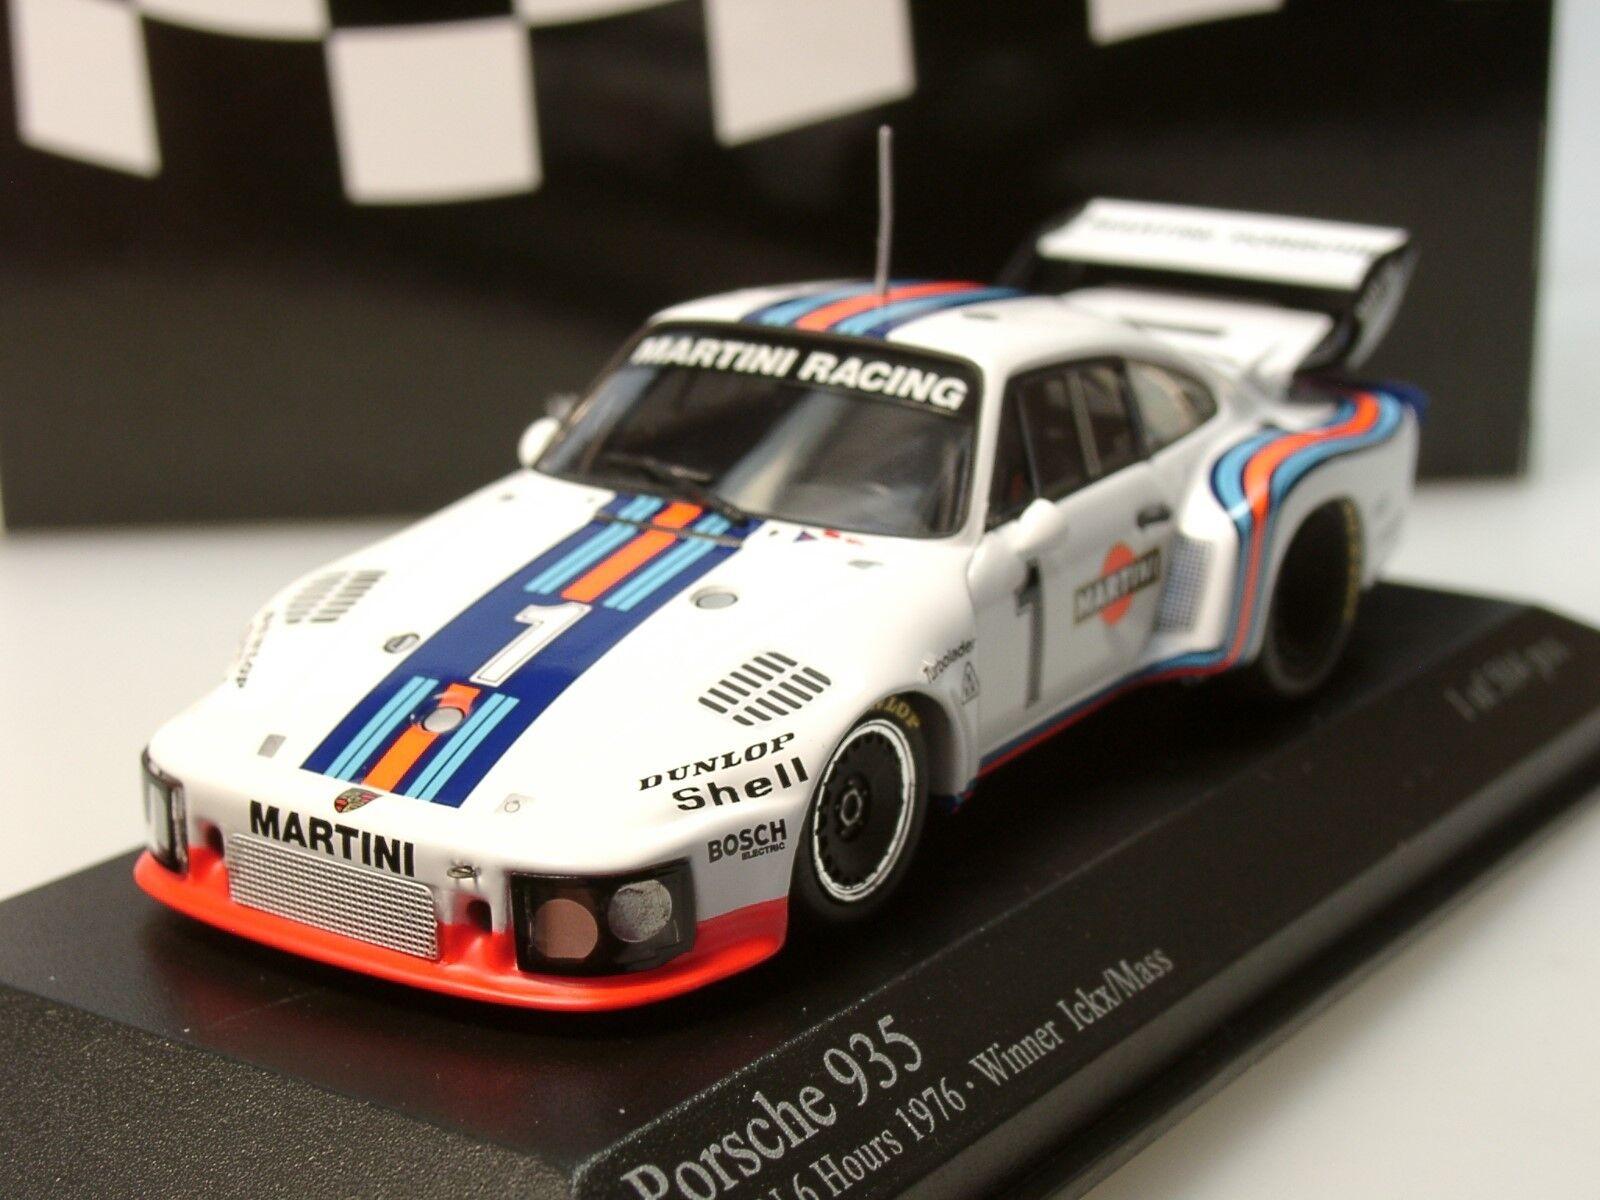 Minichamps PORSCHE 935 Martini,  1, Ickx Mass, vincitore 1976 - 400 7663 11 - 1 43